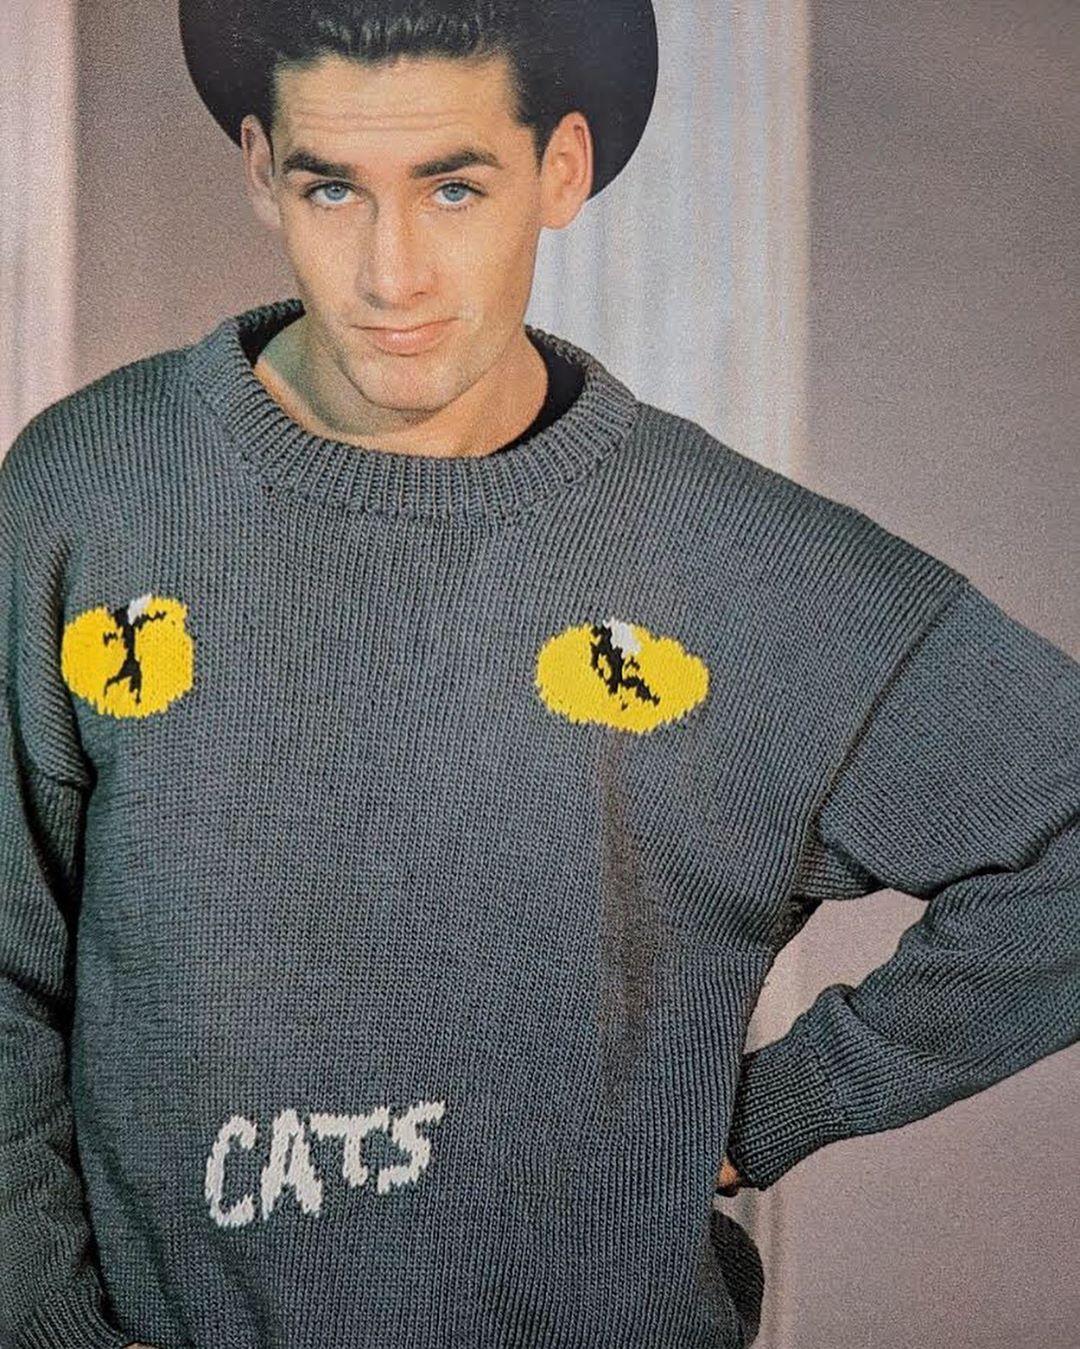 80s-cat-knits-3.jpg